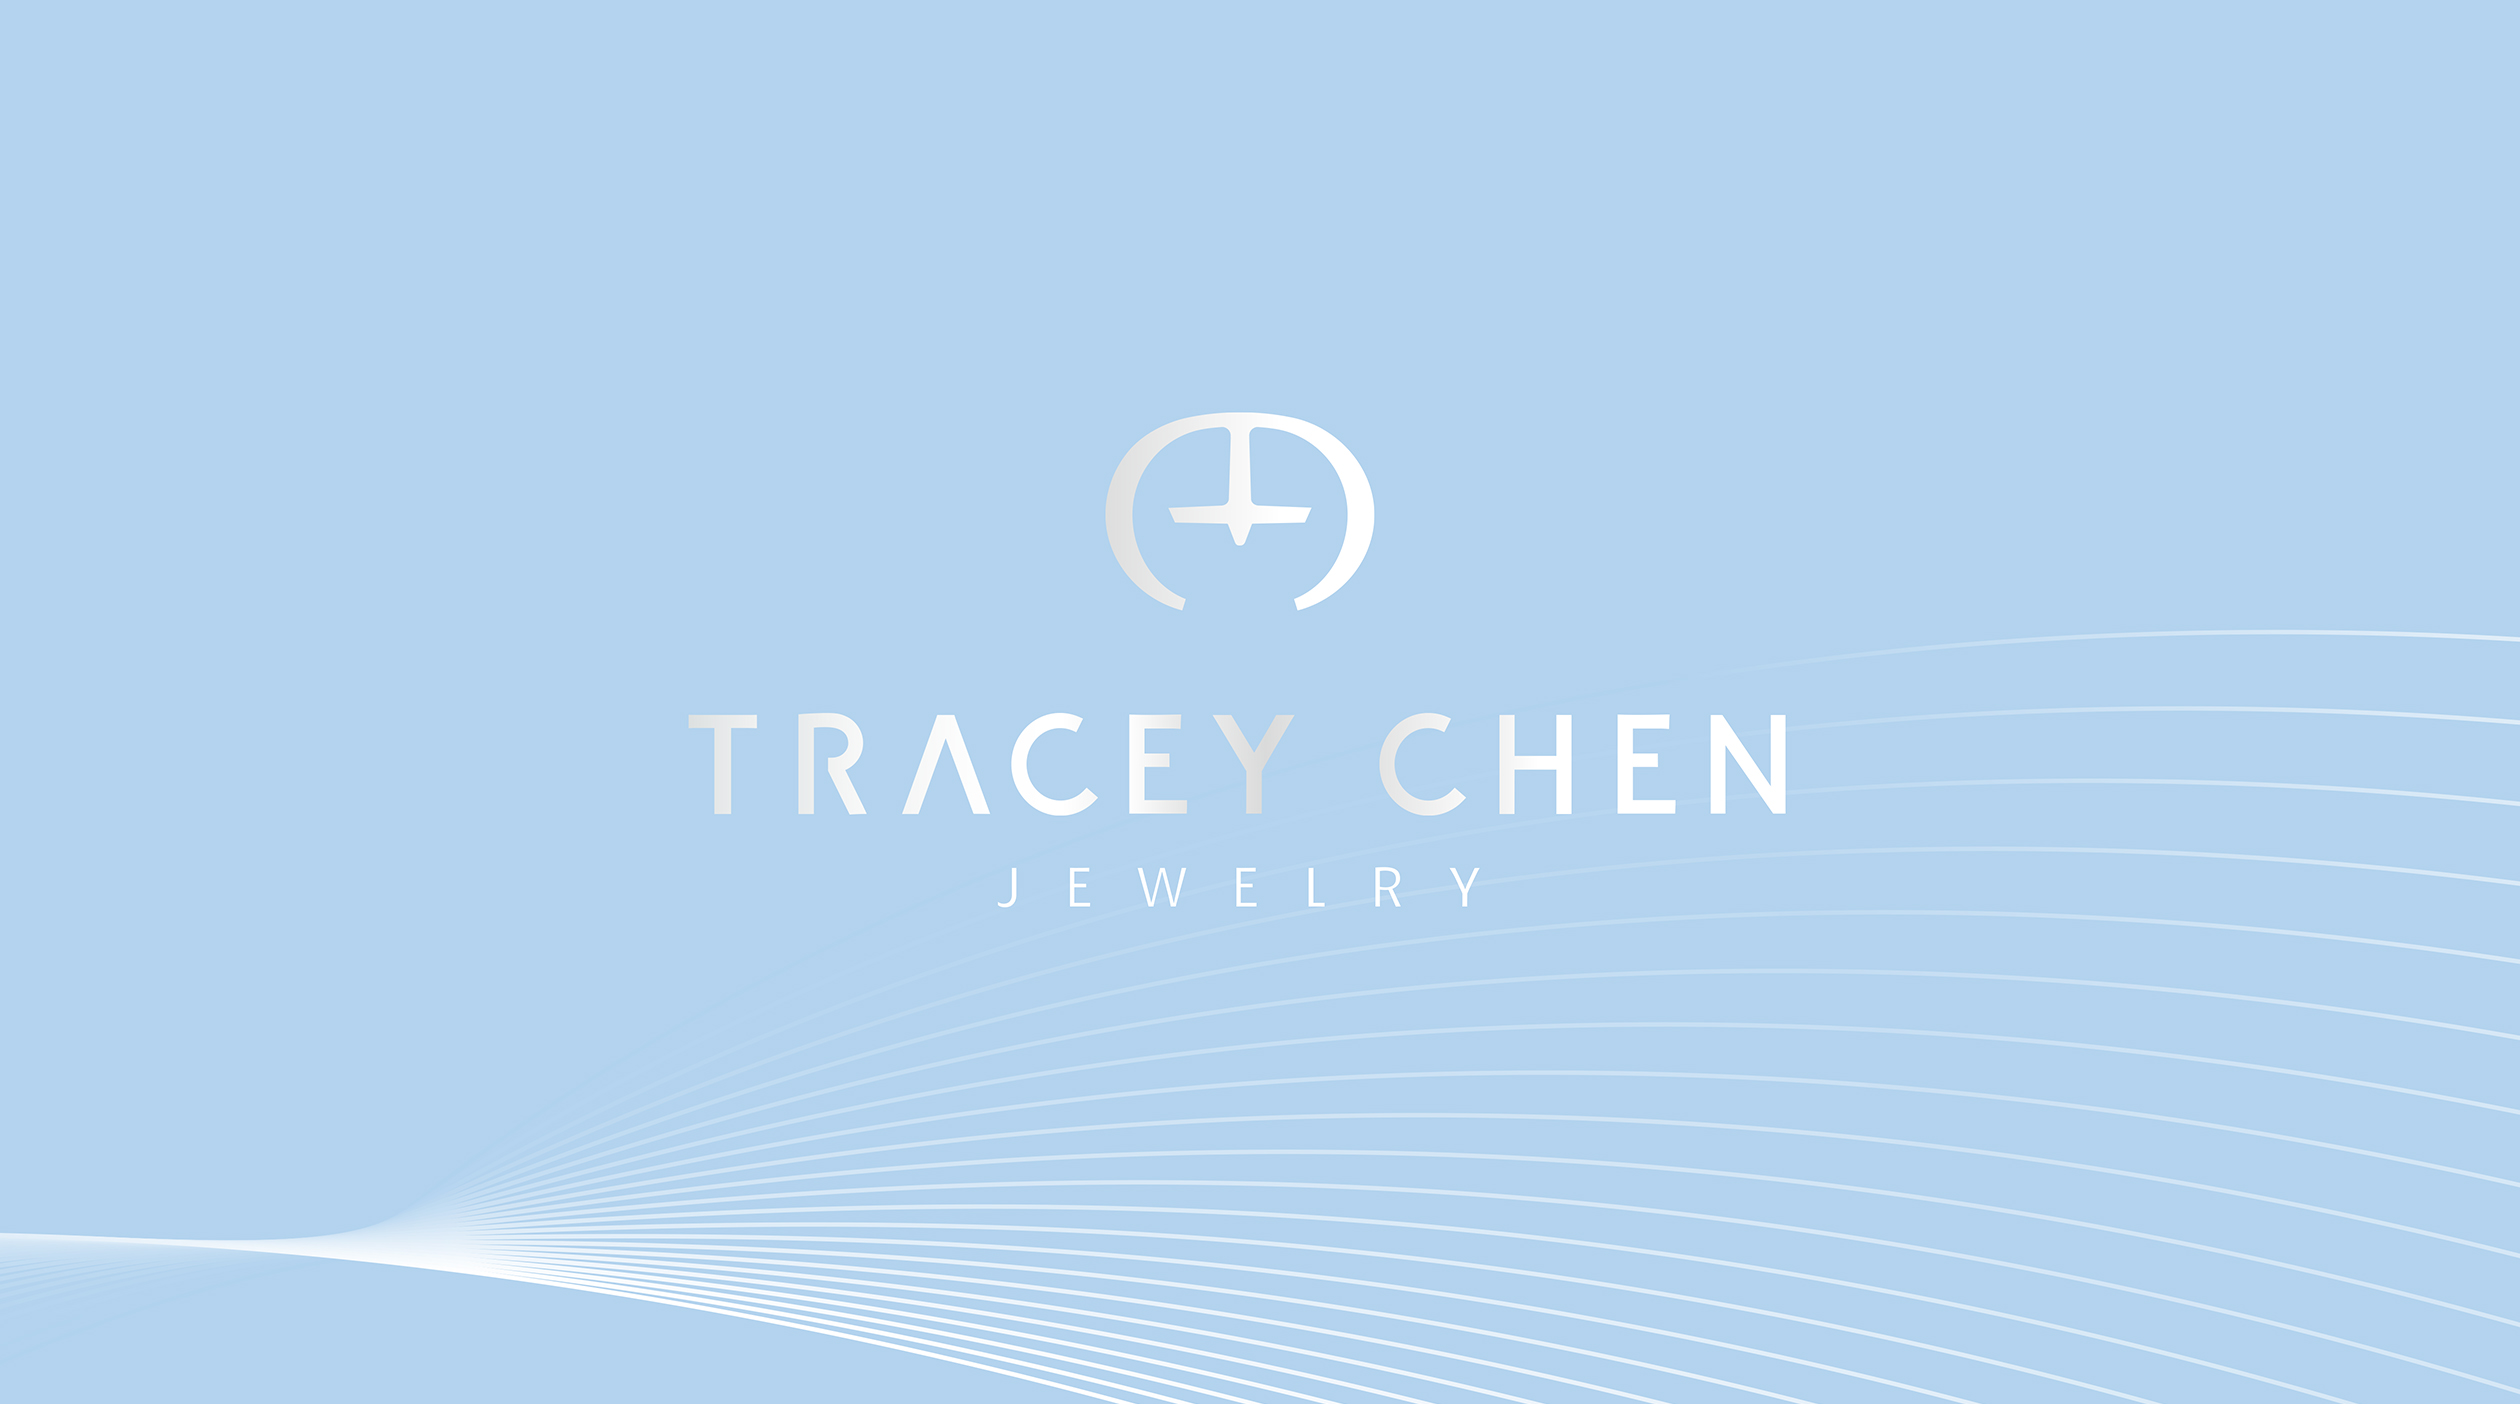 TRACEY CHEN